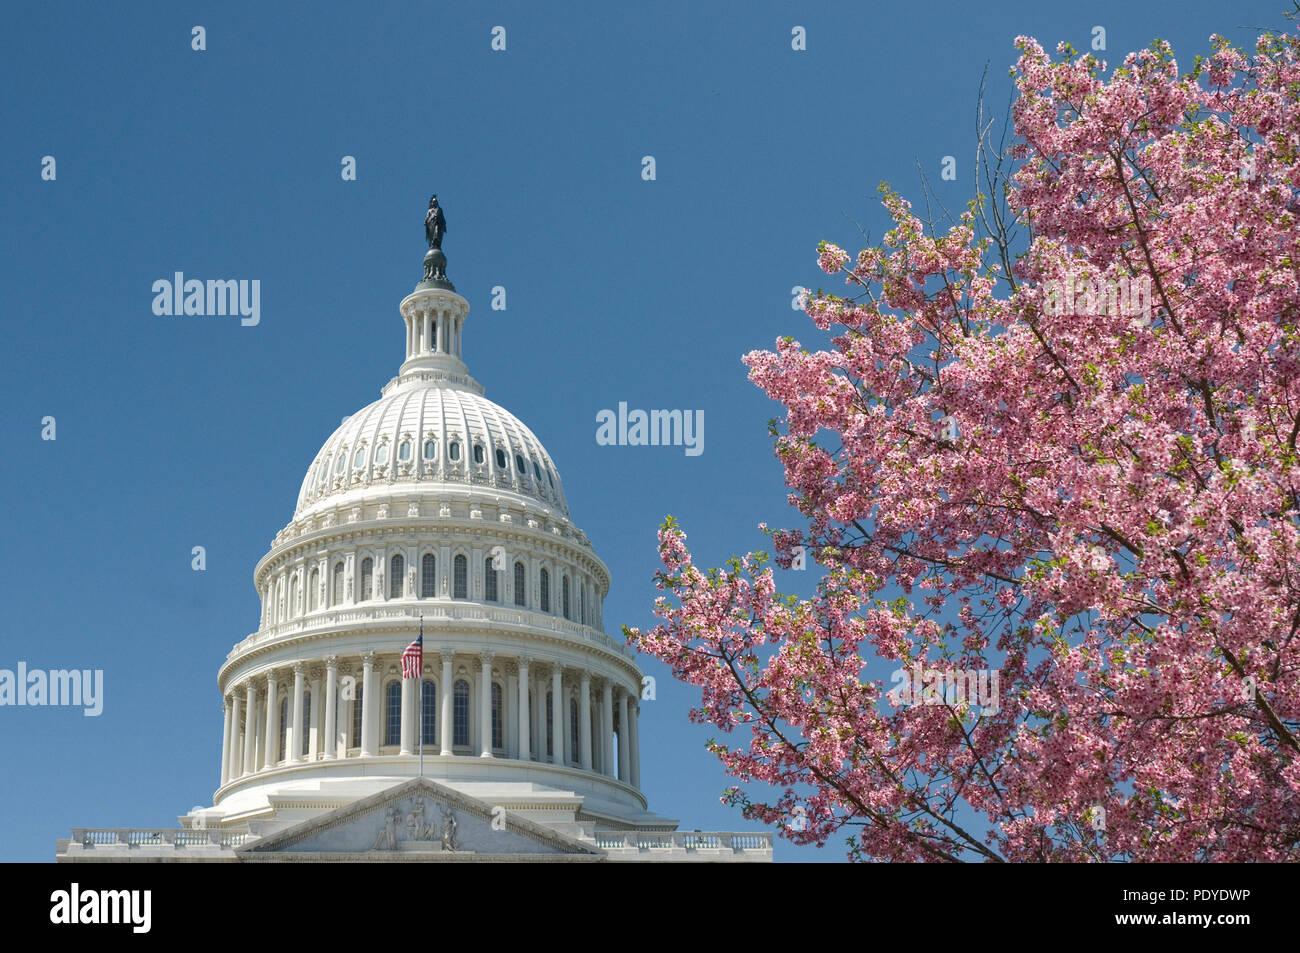 U.S. Capitol Building, Washington D.C., Cherry Blossom Festival - Stock Image